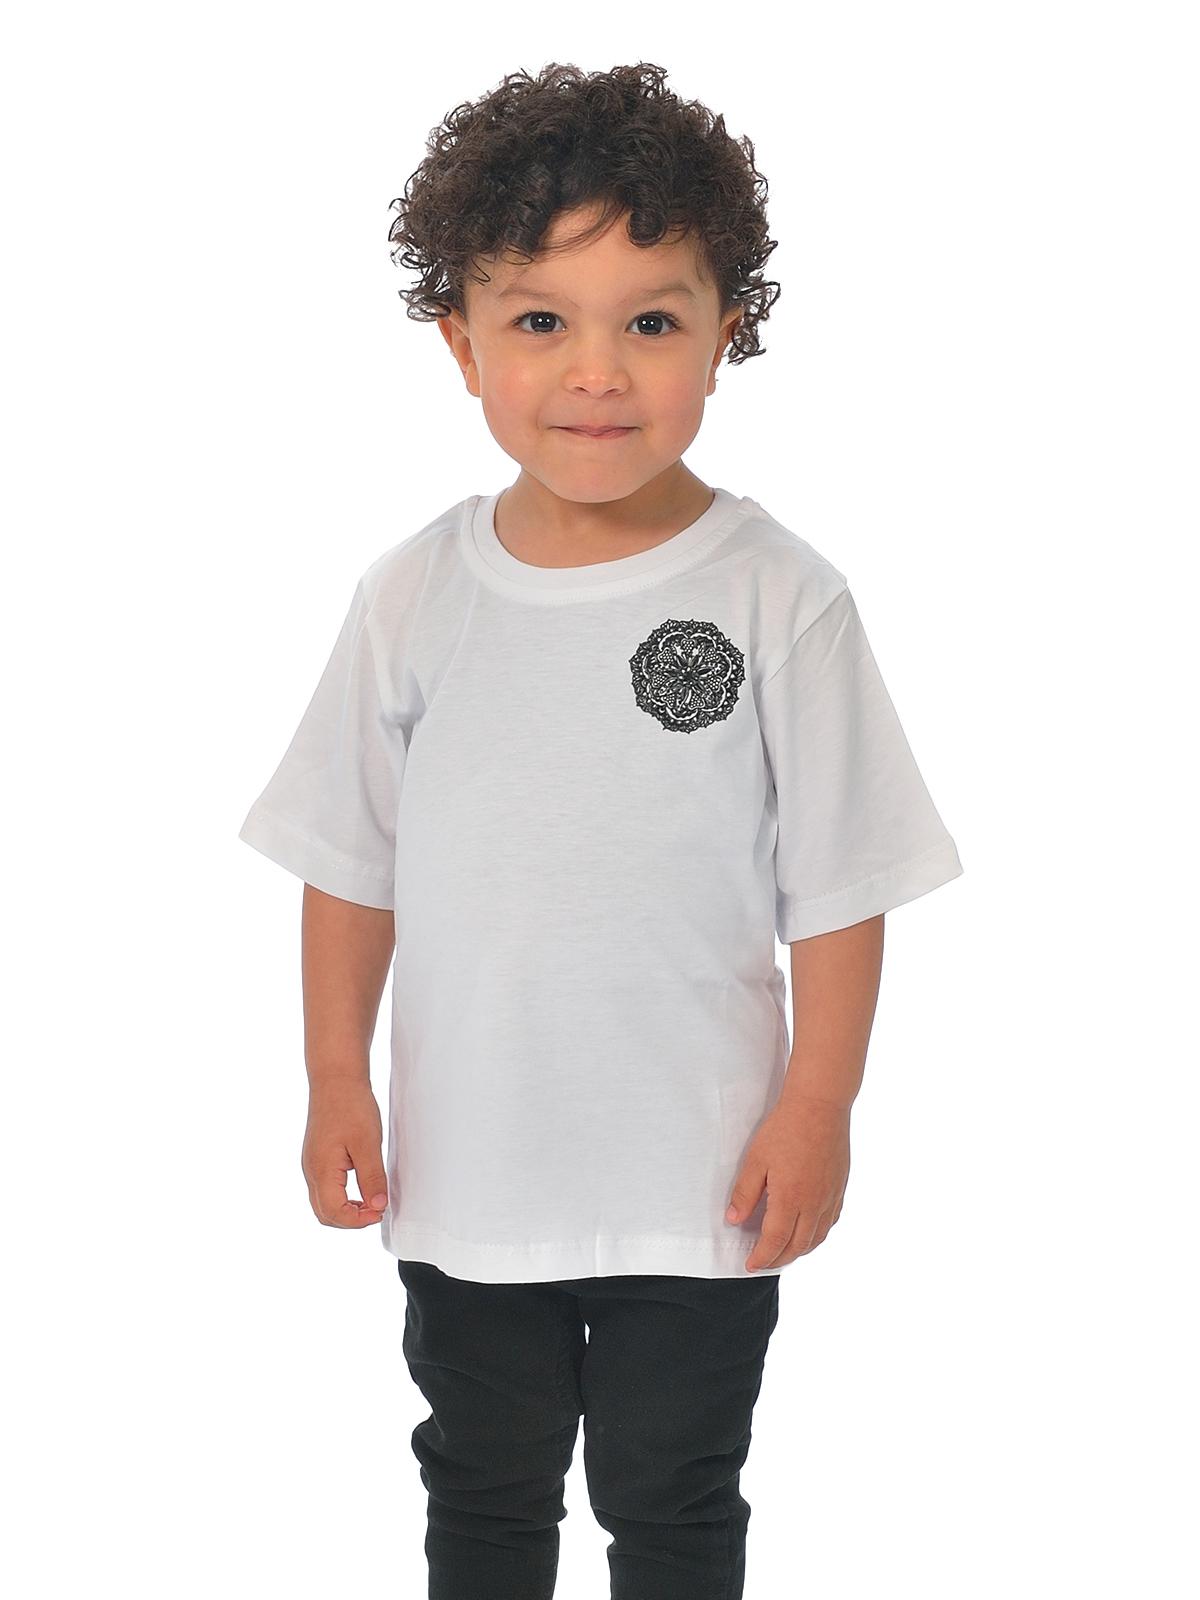 Boy t shirts online shopping